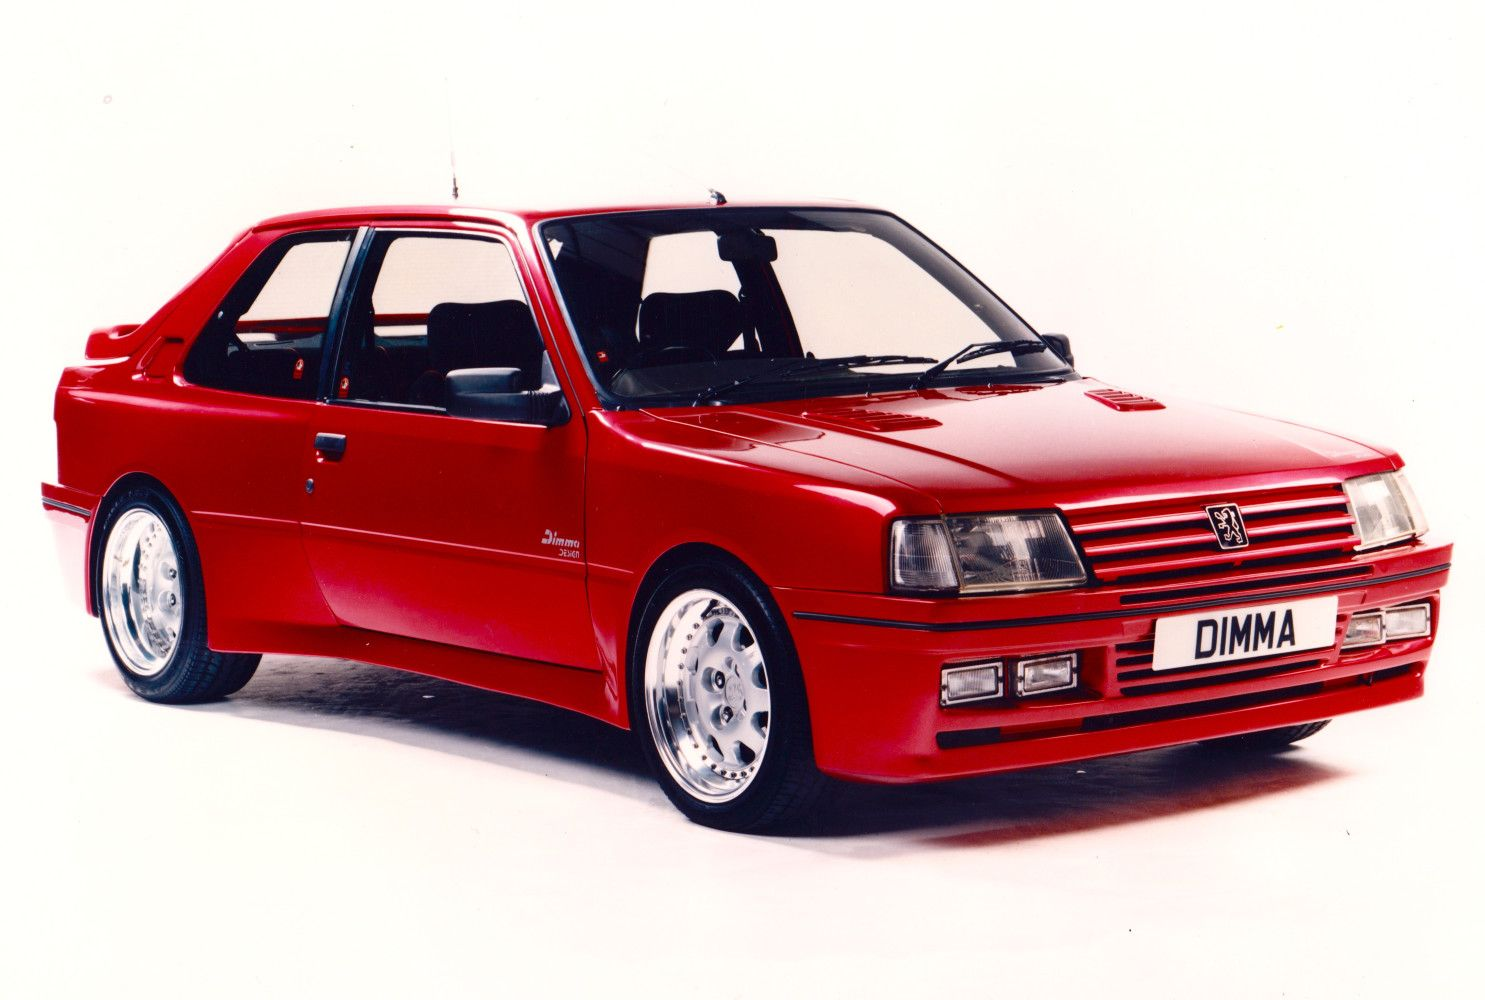 peugeot 205 gti 2.0 tct | dream car | pinterest | peugeot, cars